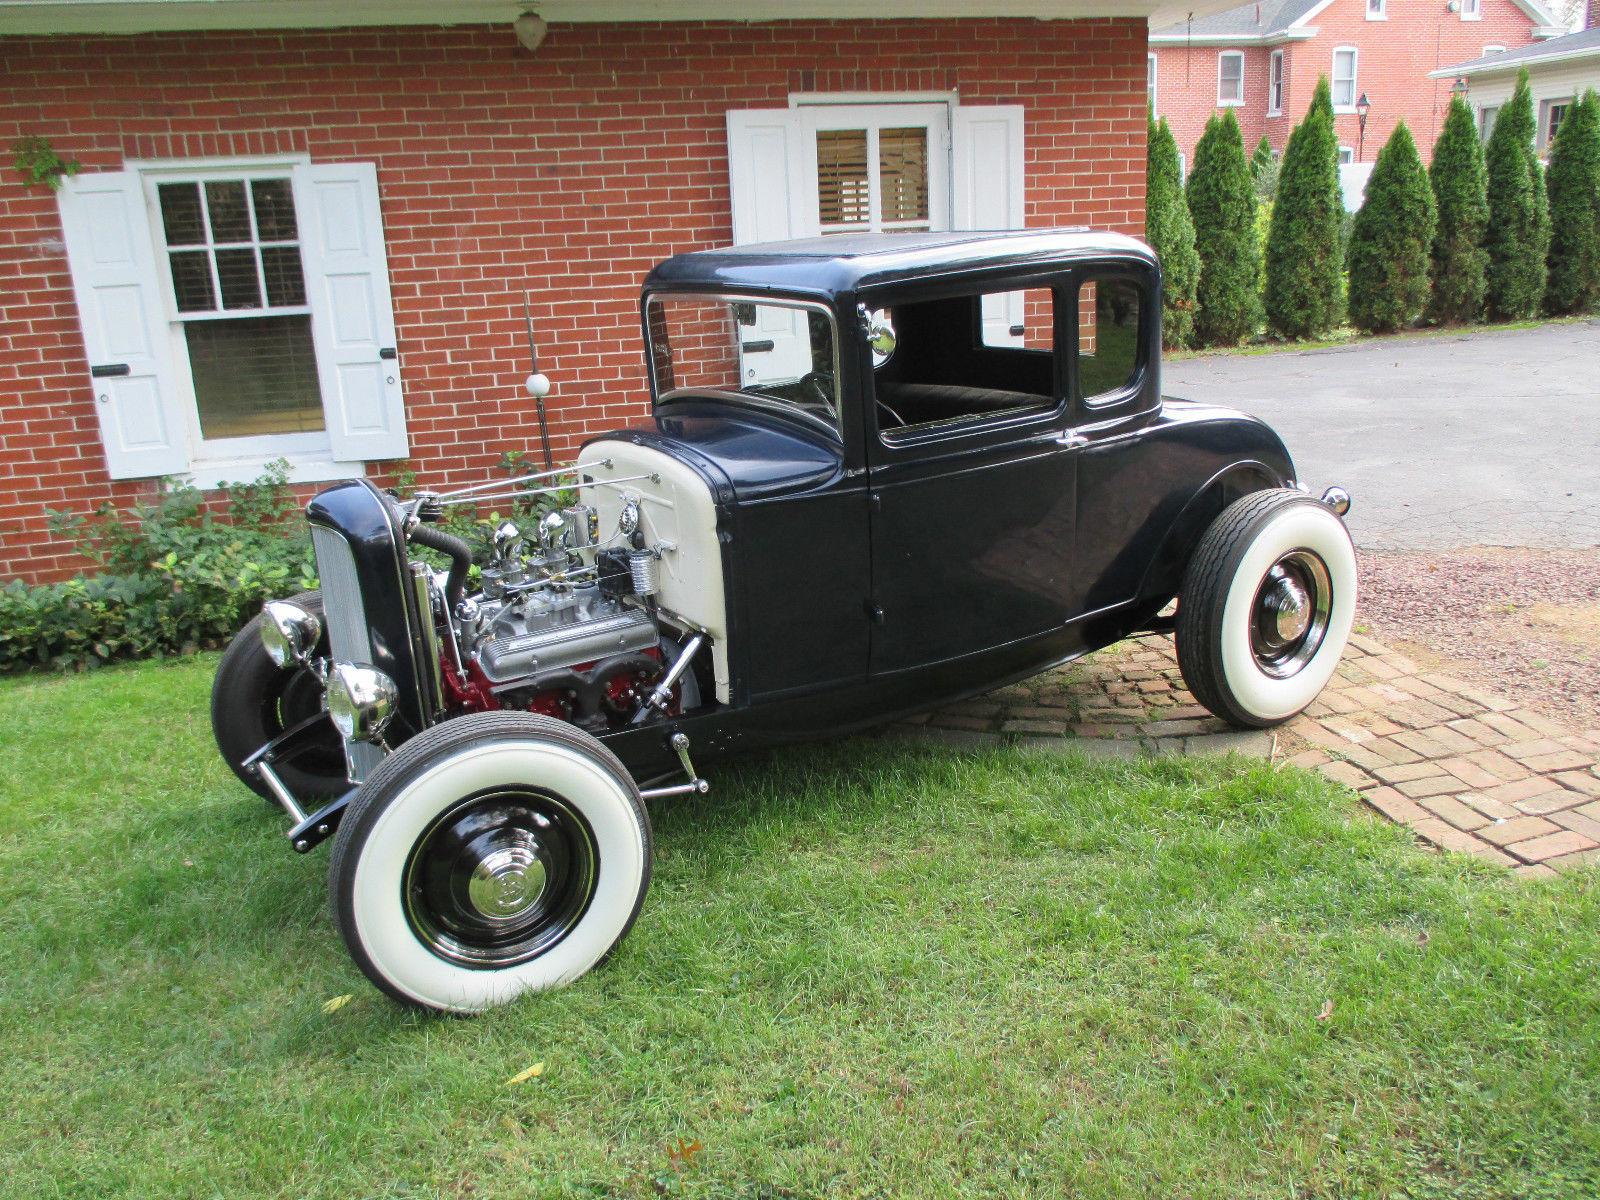 1930 Model A Ford Highboy Hot Rod 32 Ford Frame - Classic Ford Model ...